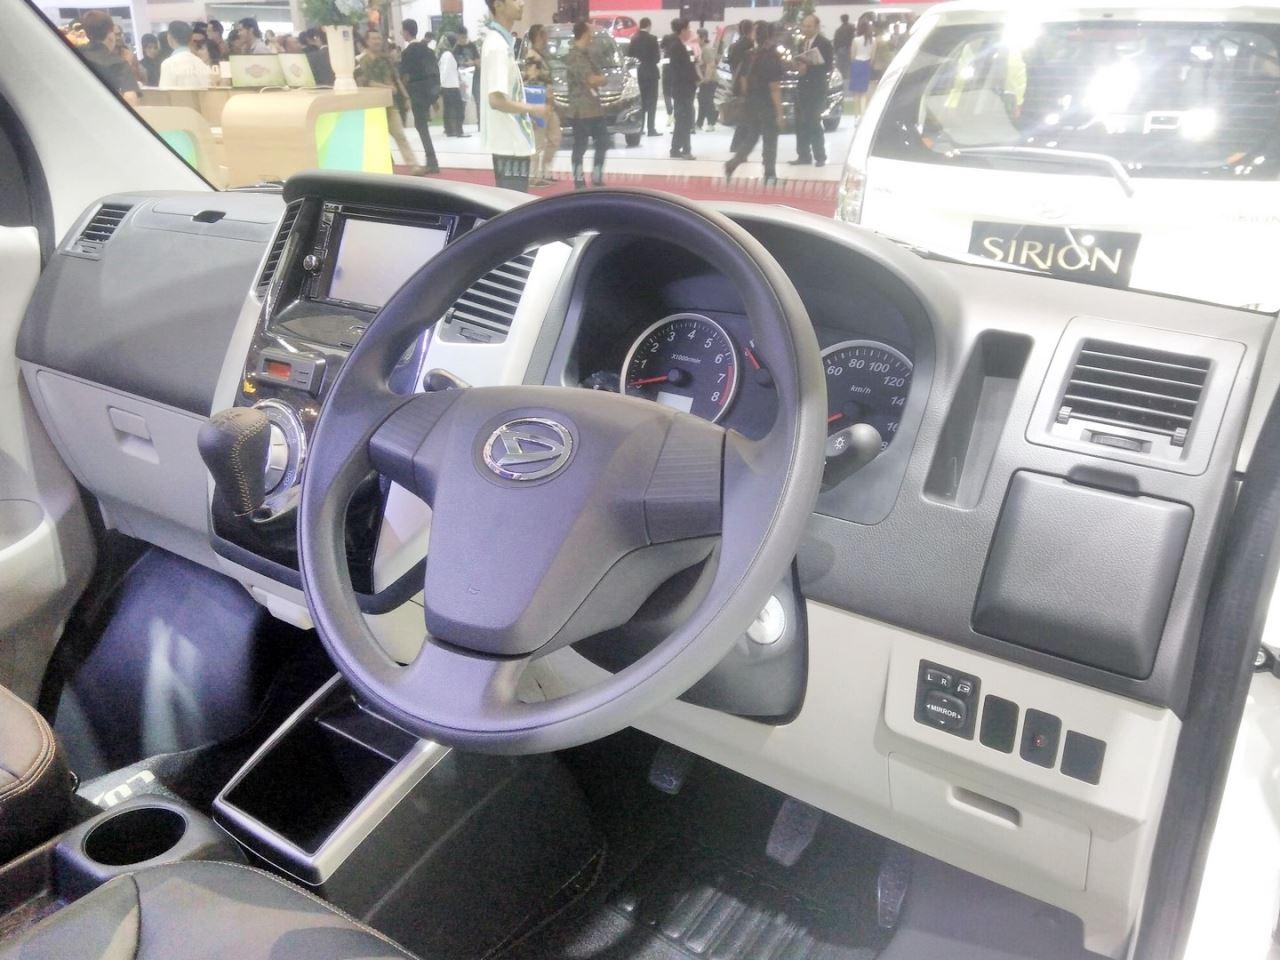 Harga Jual Daihatsu Luxio Models By Year Rent Car Wiring Diagram Special Edition At Giias 2017 Dashboard